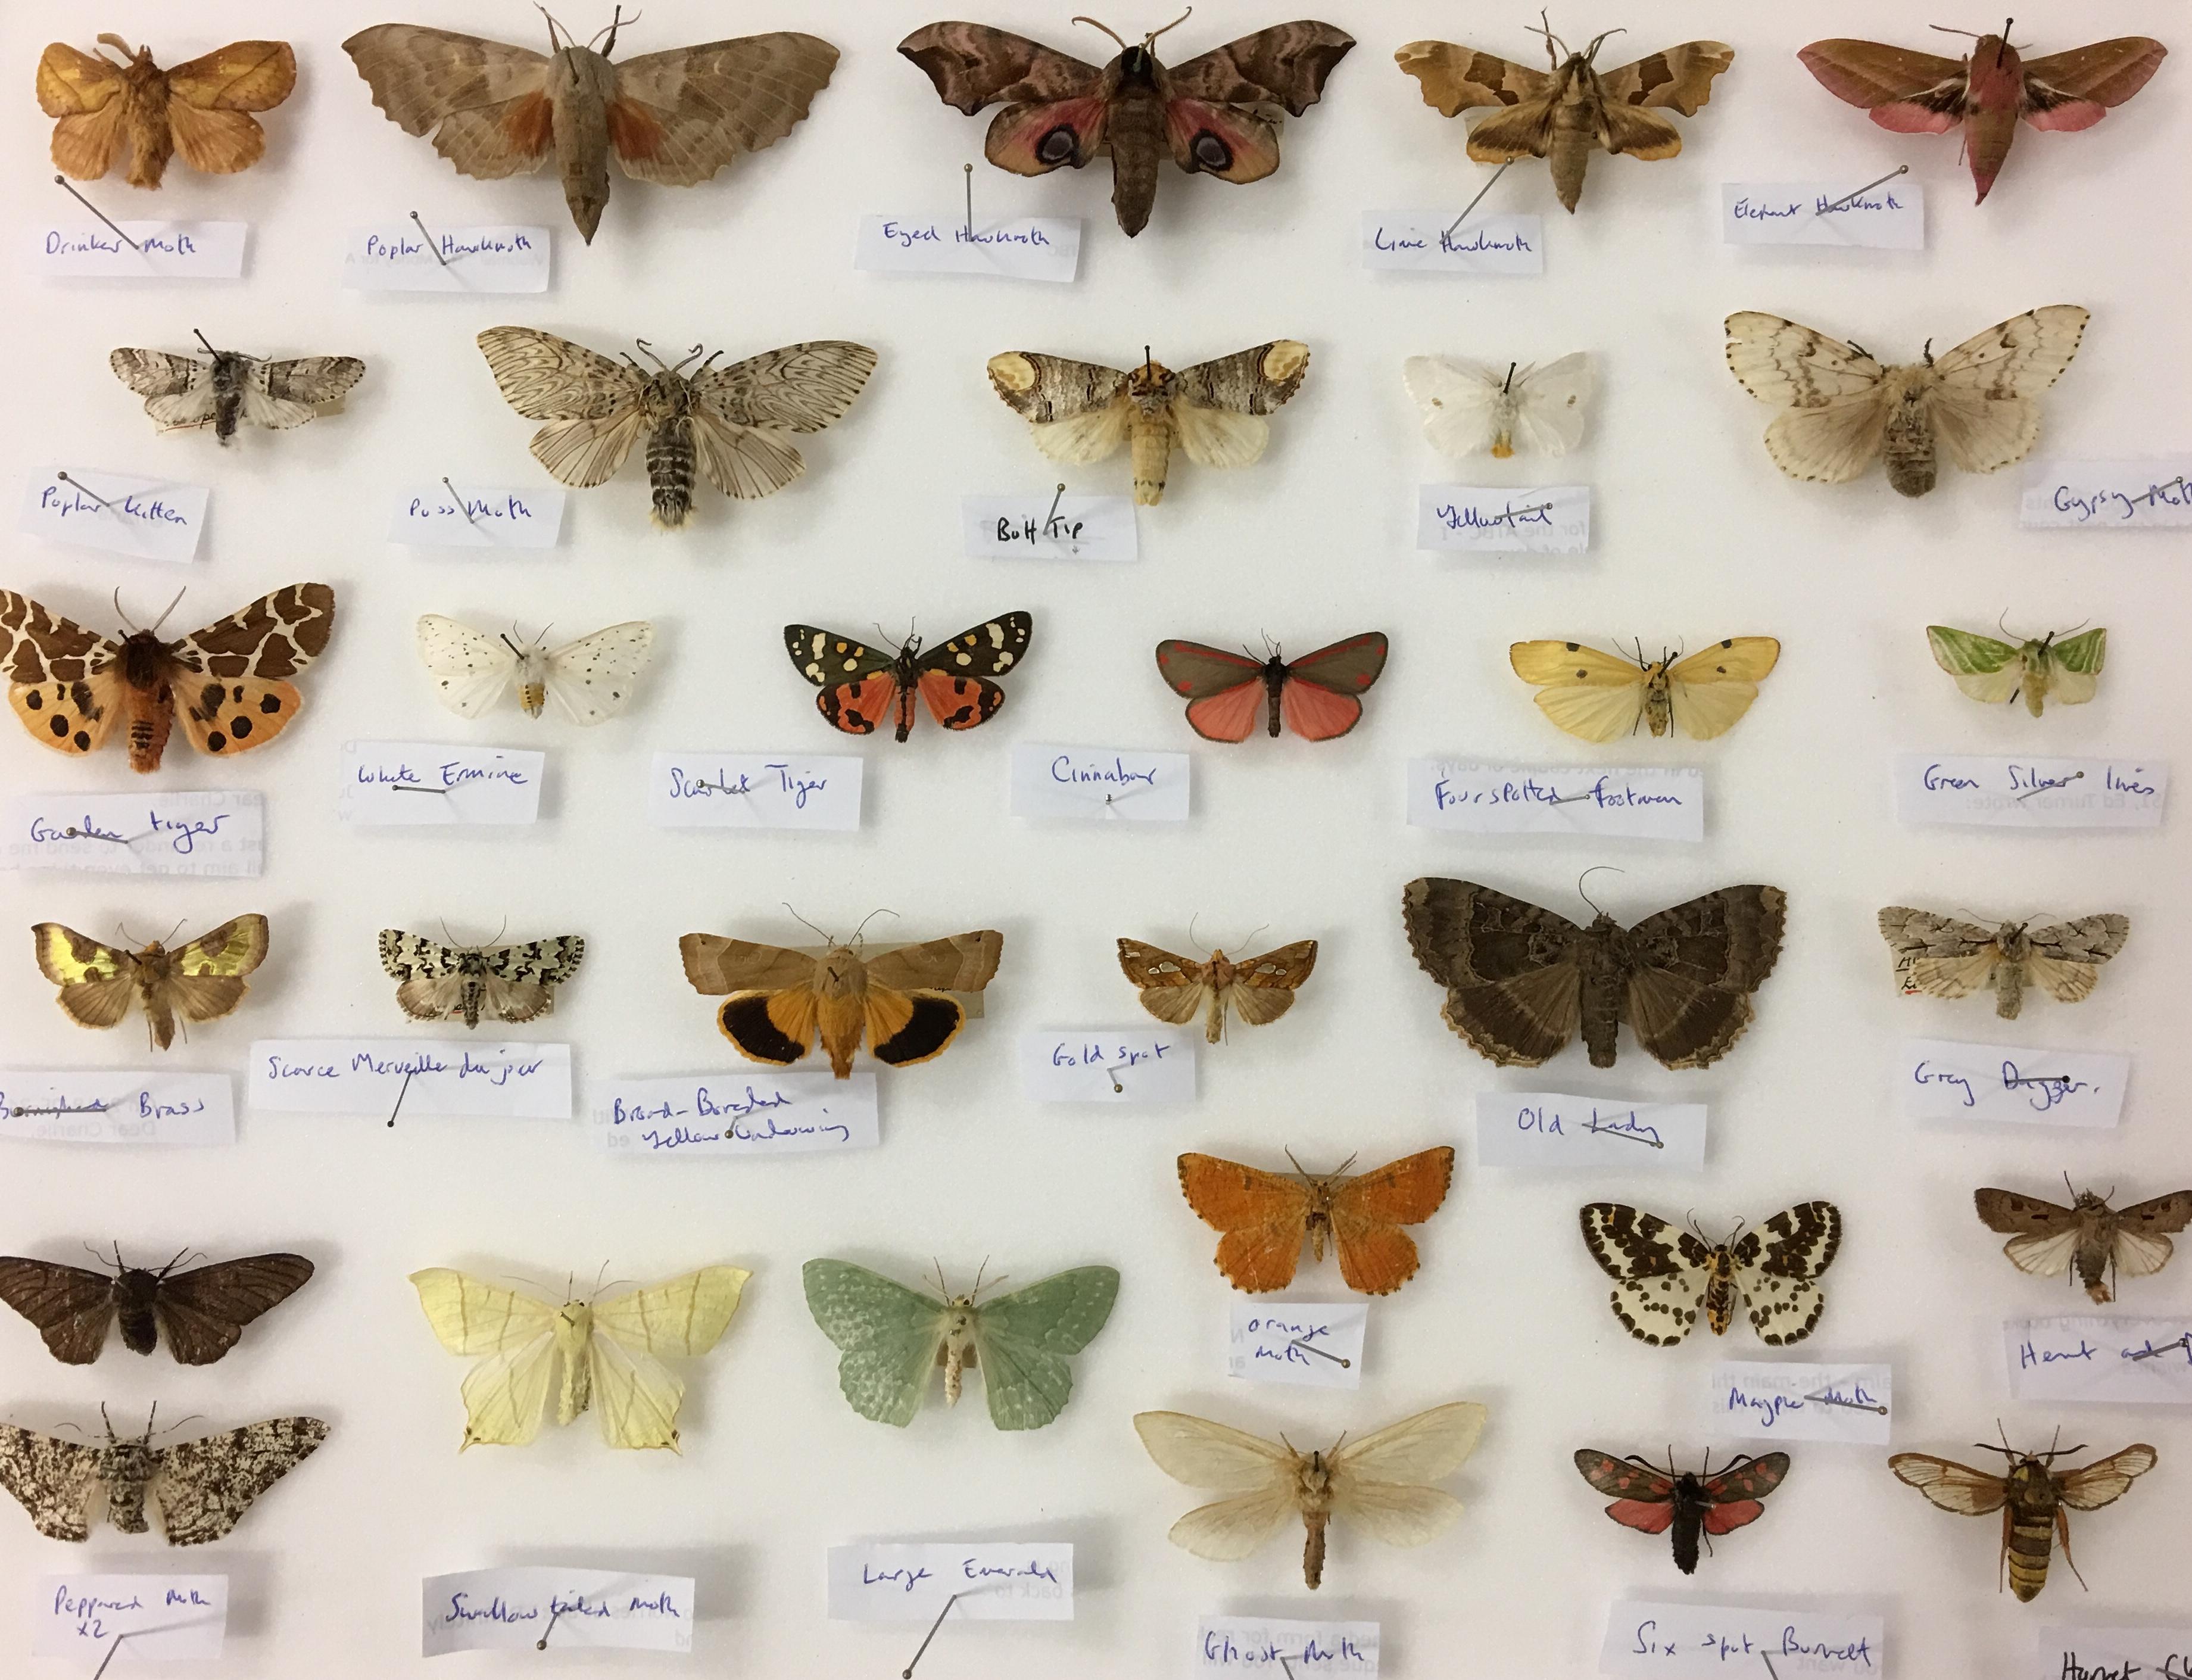 UK moths. University Museum of Zoology collection. Copyright University of Cambridge